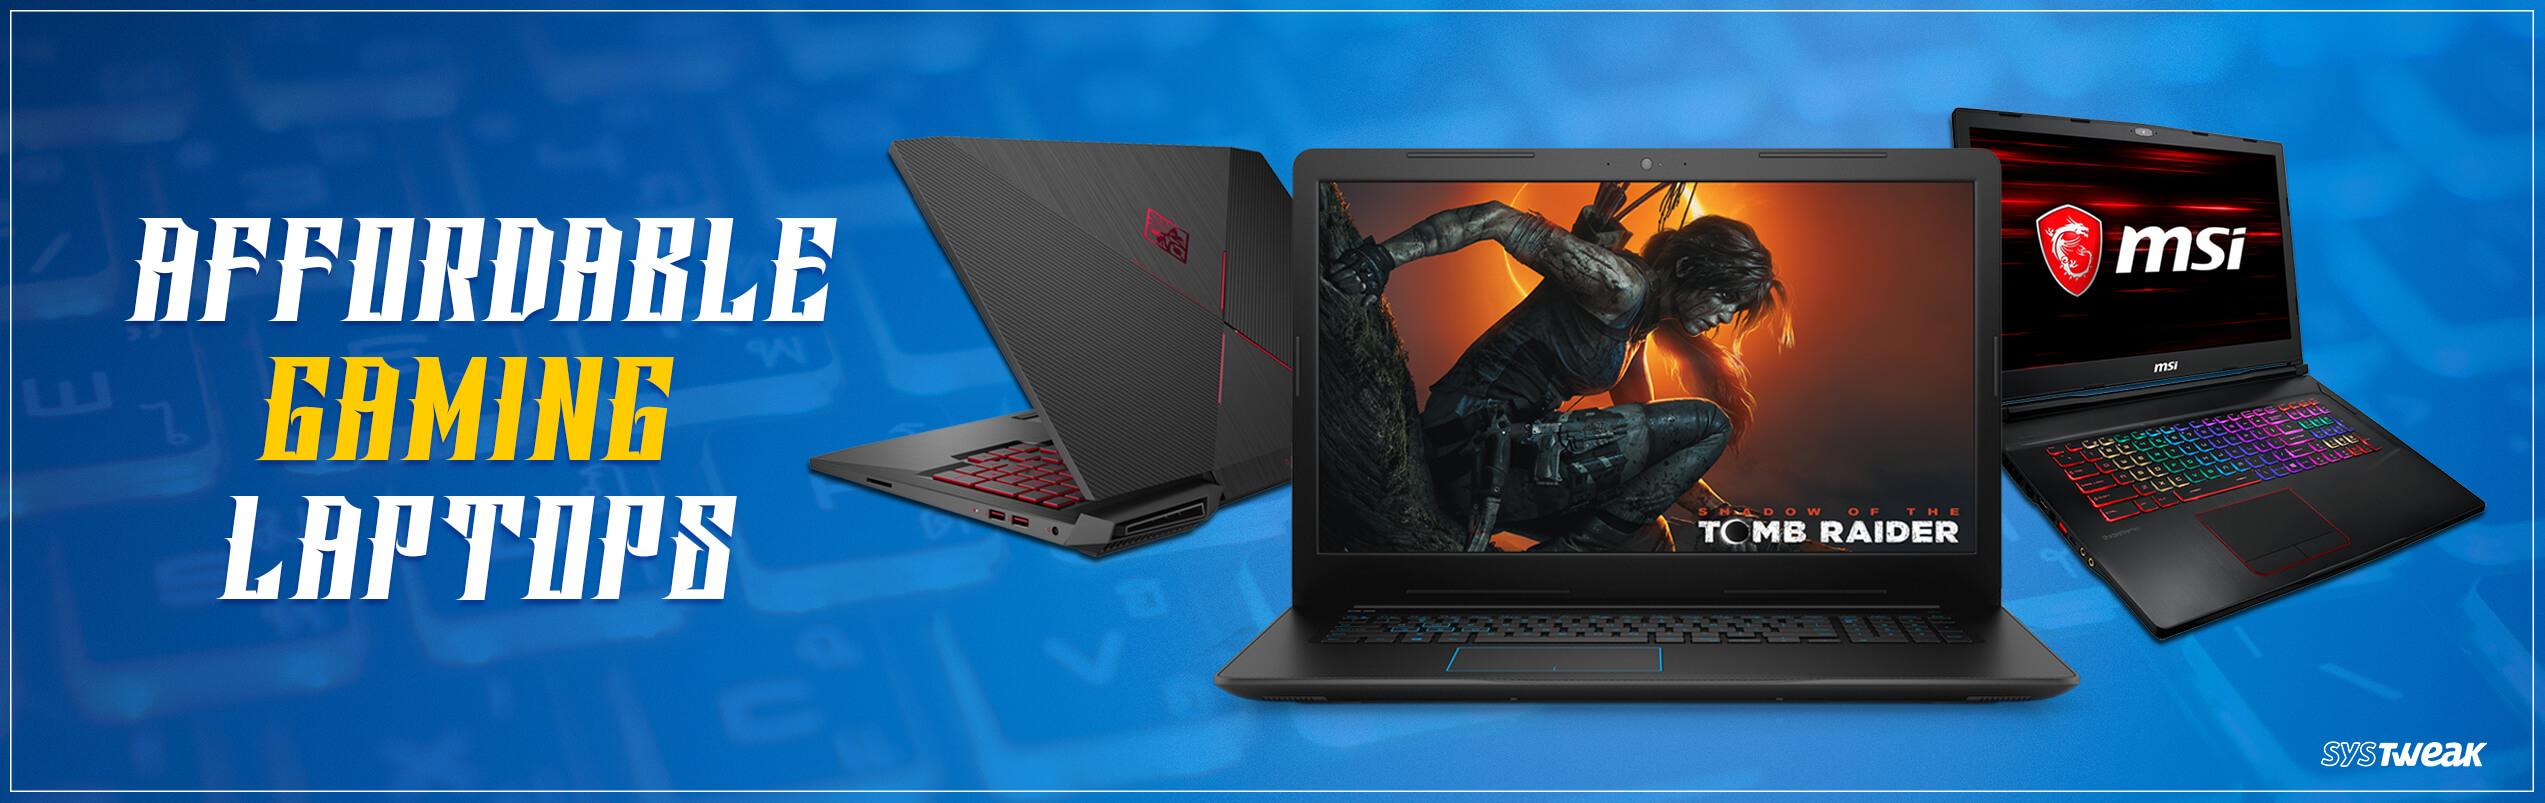 7 Best Affordable Gaming Laptops 2018